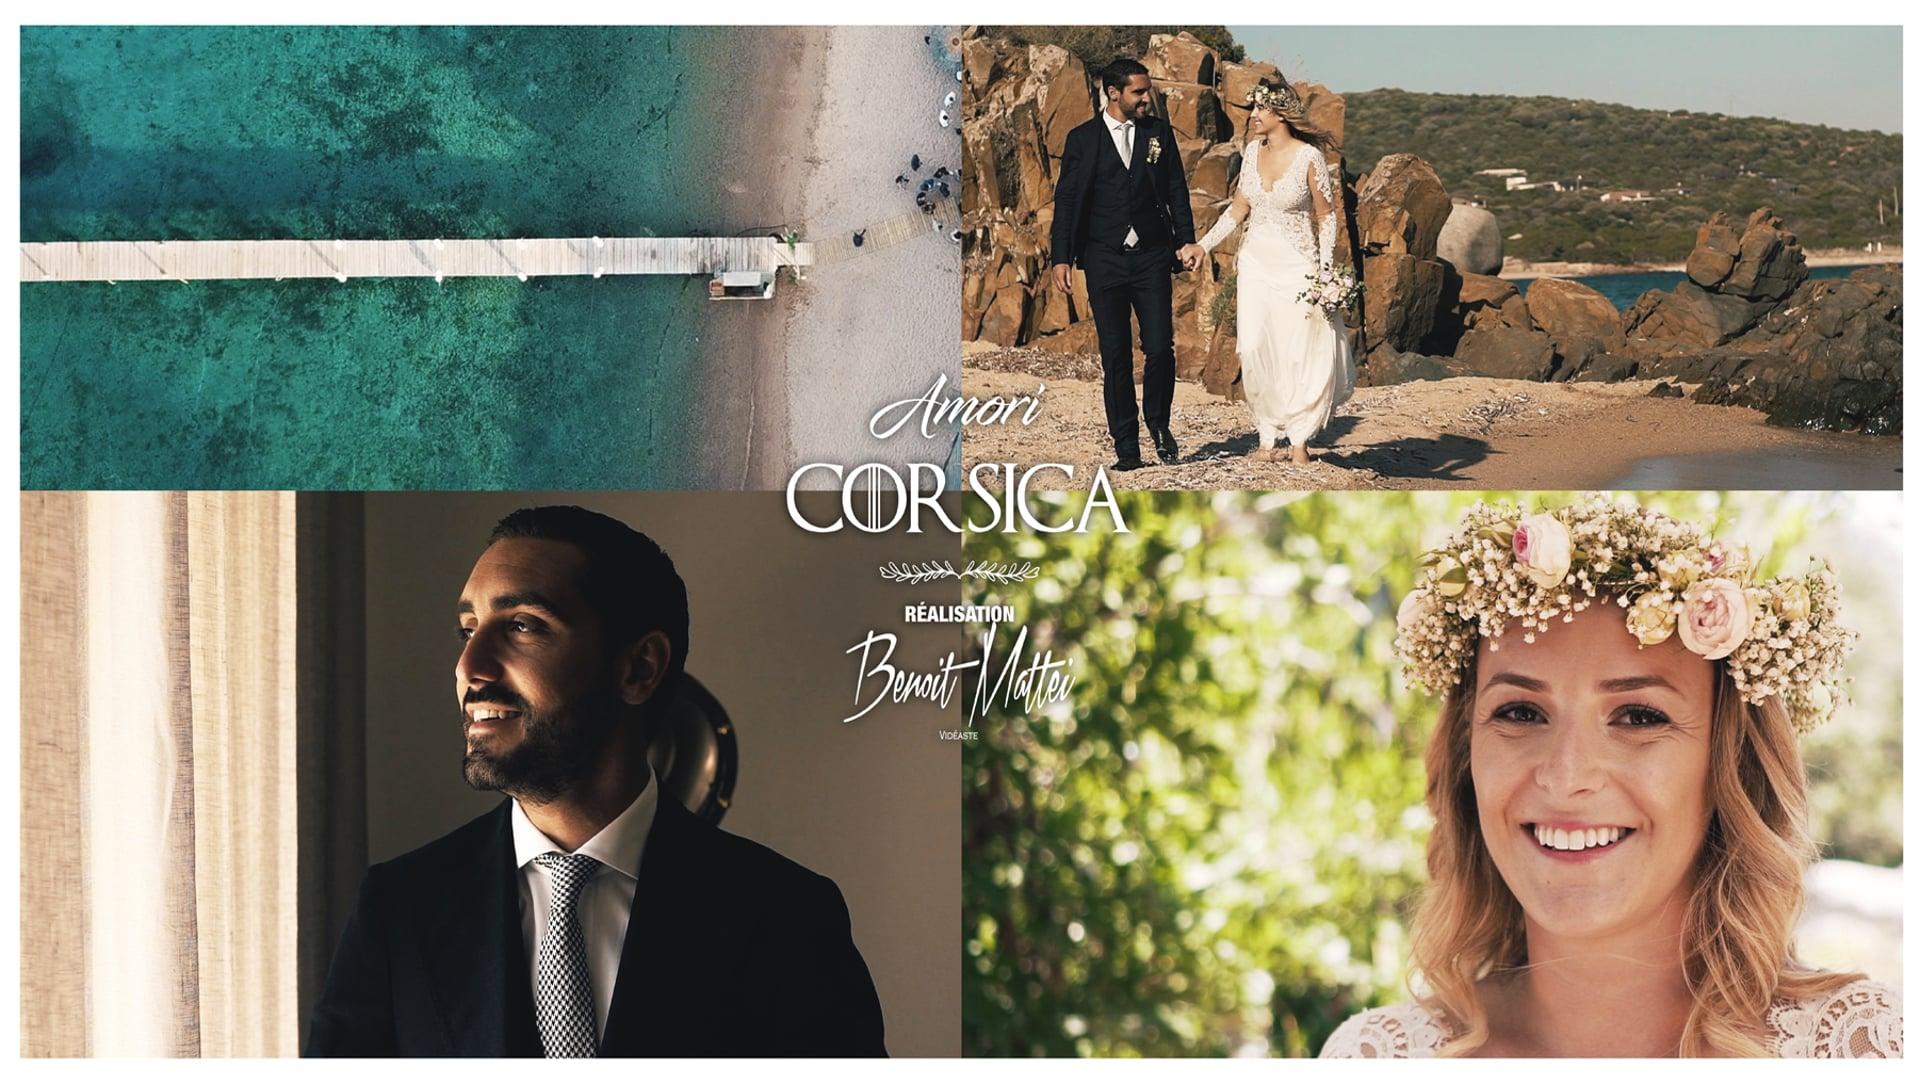 Amori Corsica